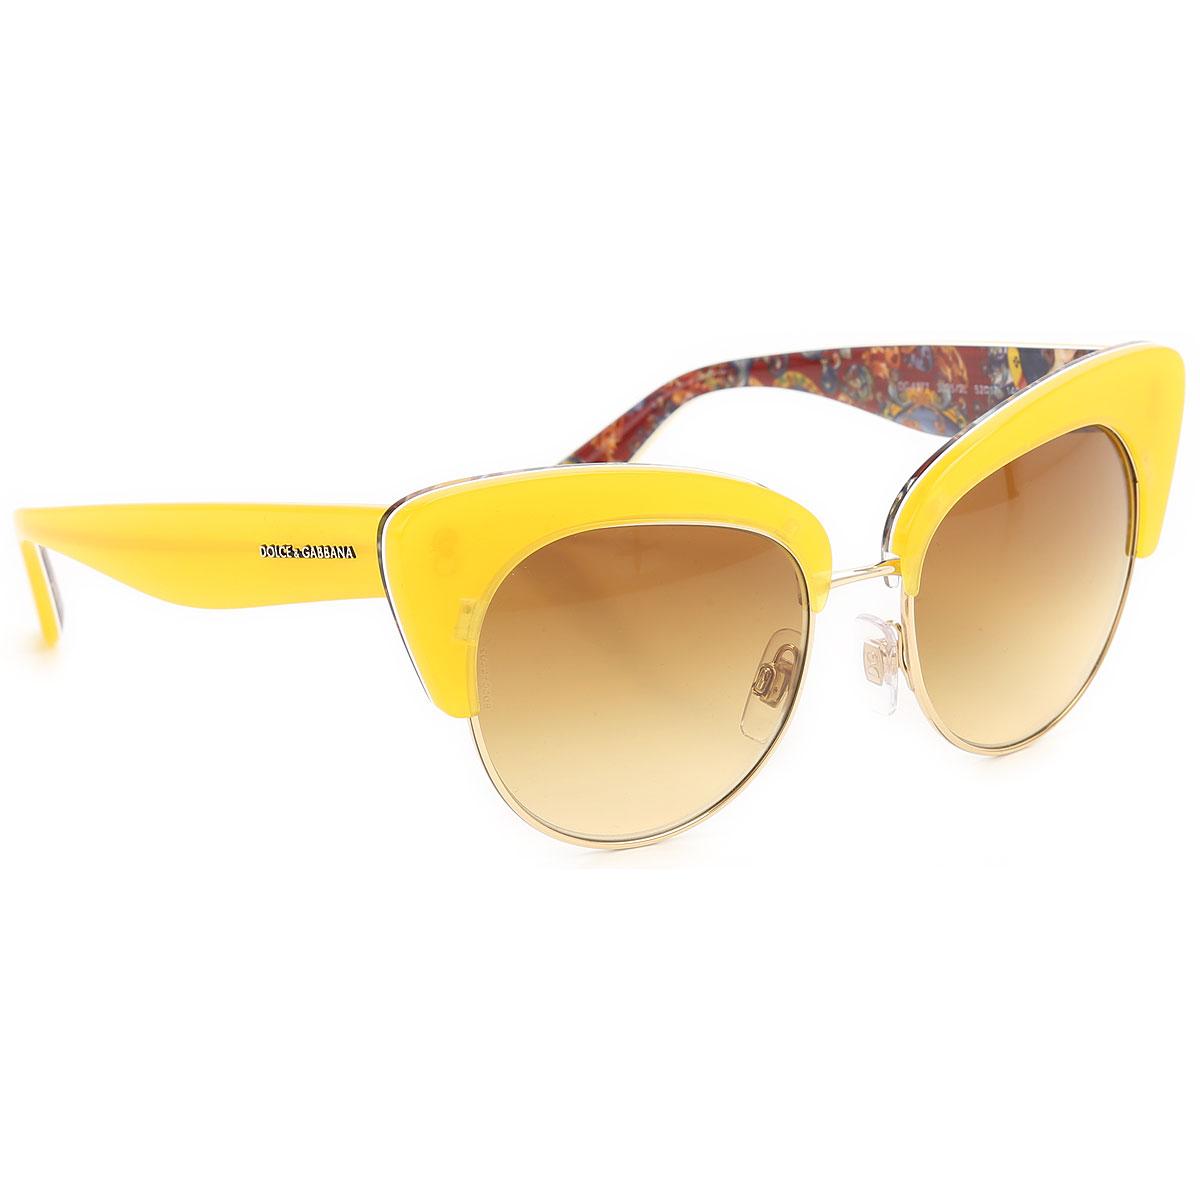 437ea6bfbbd1 Dolce   Gabbana. Sunglasses